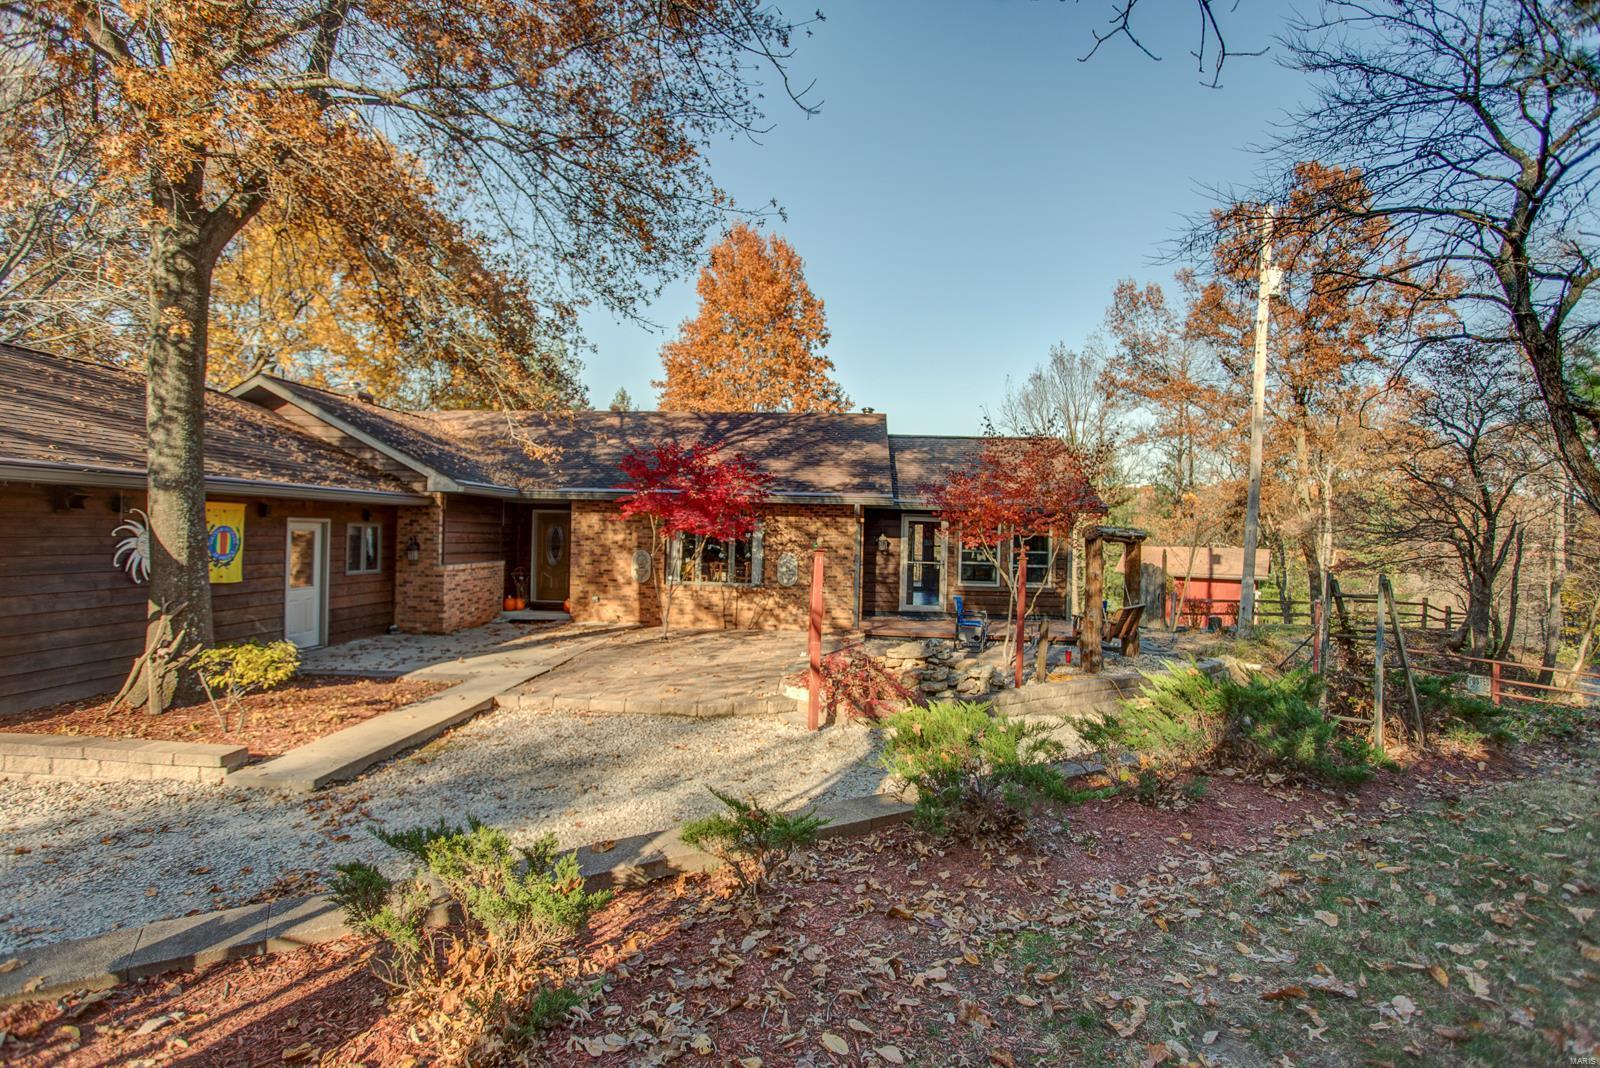 744 Shady Lane Property Photo - Freeburg, IL real estate listing